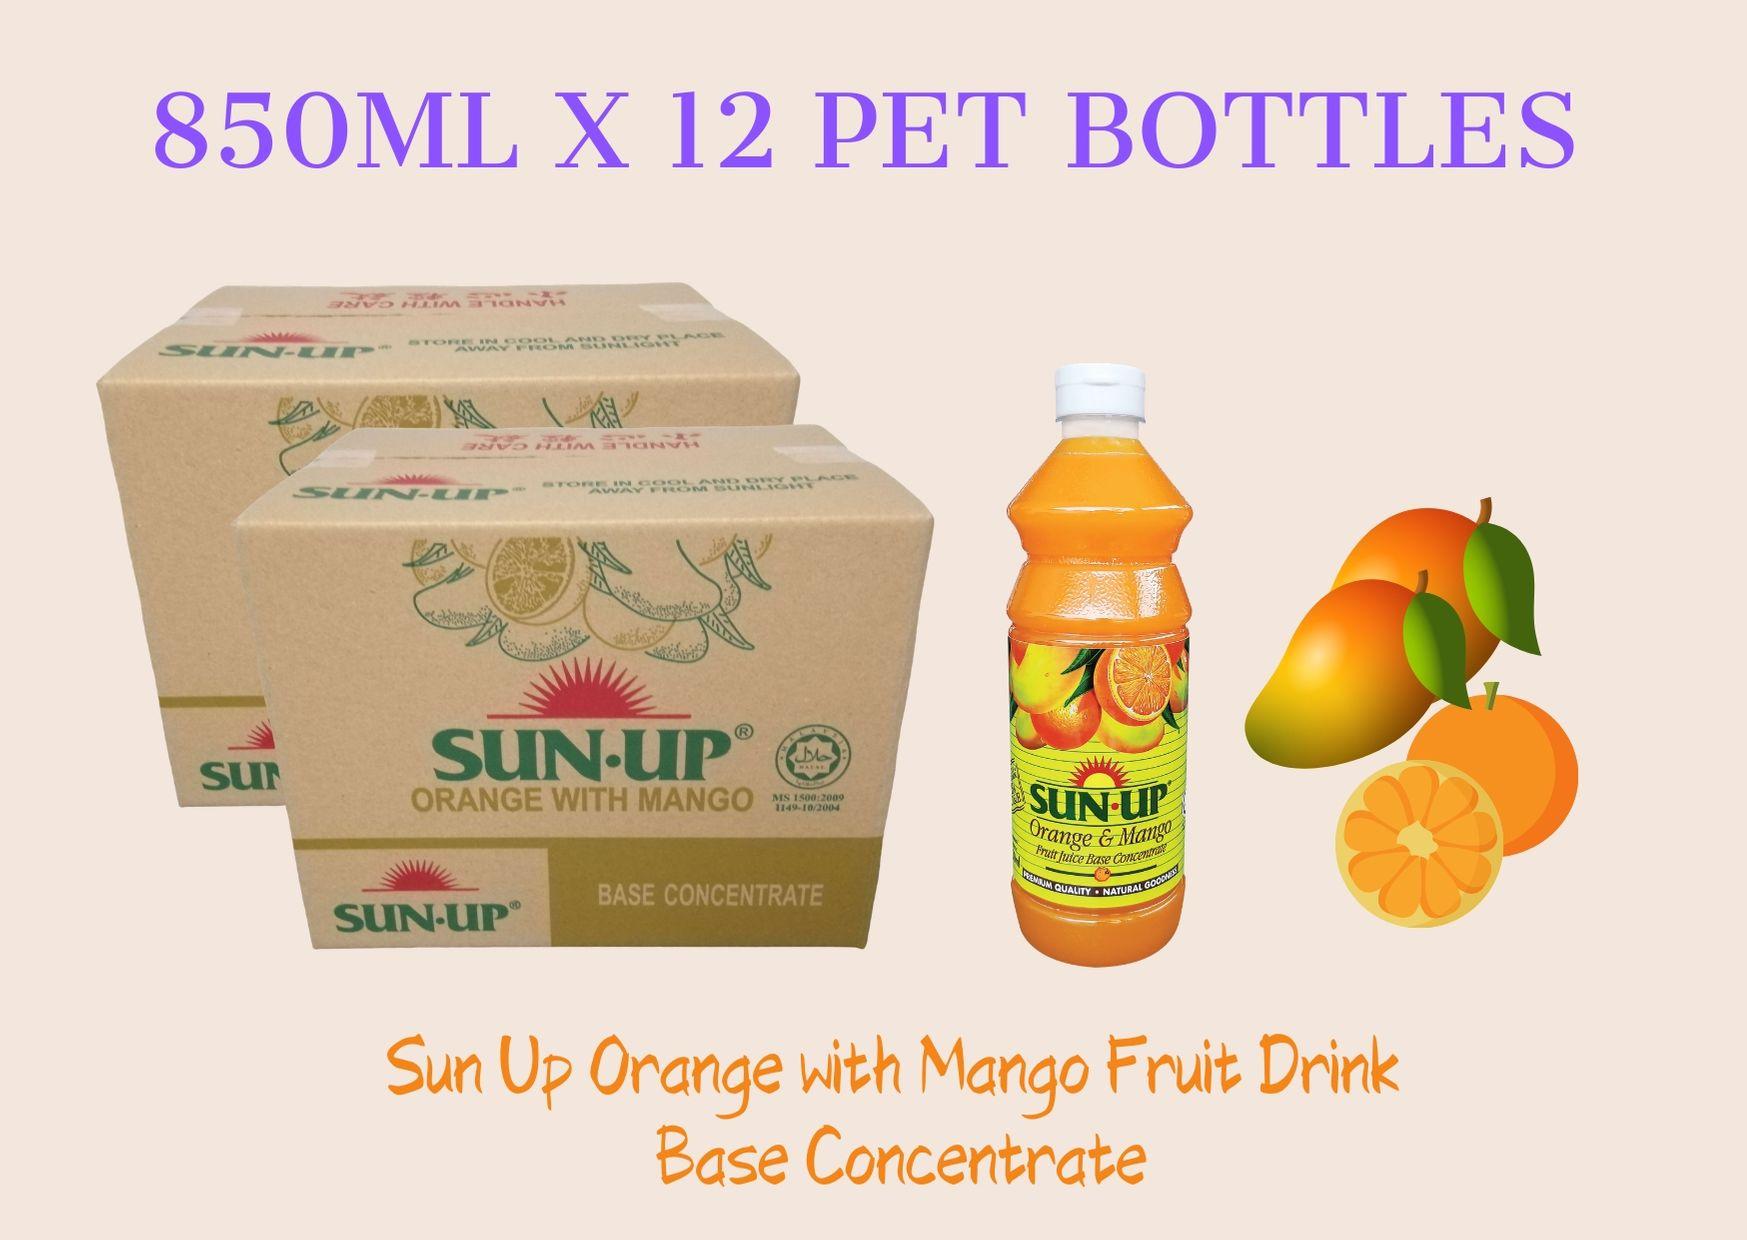 12Bottles Sun Up Orange with Mango Fruit Drink Base concentrate